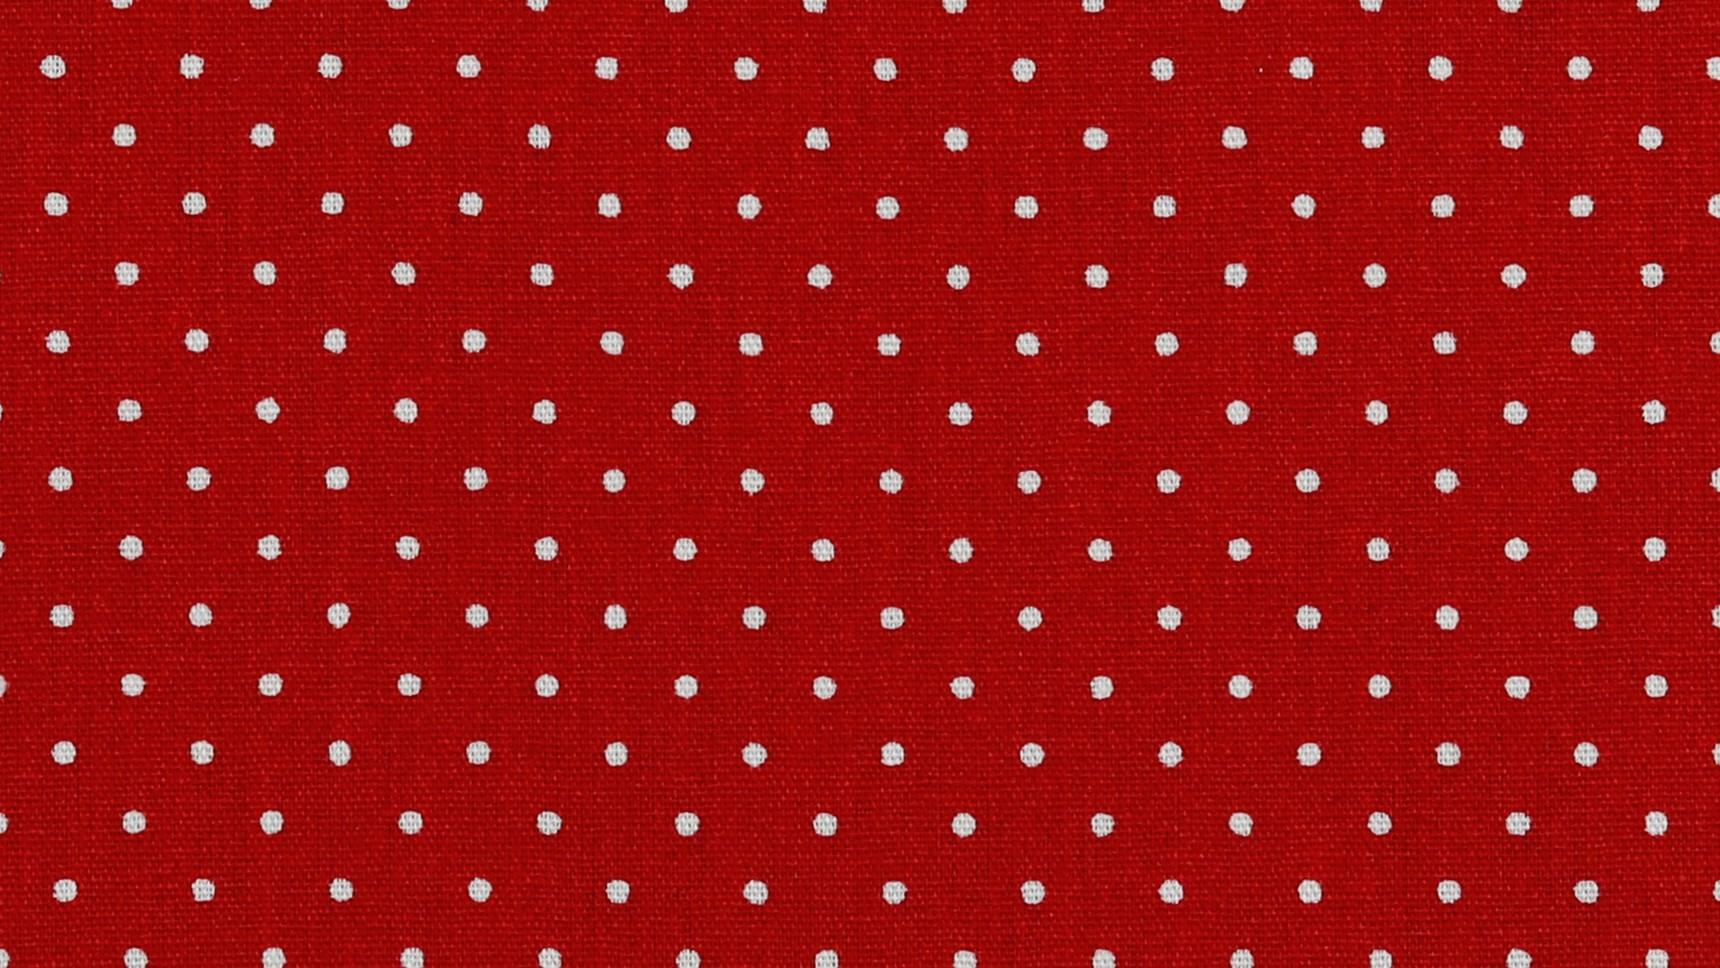 Pintinhas Petit - Vermelho